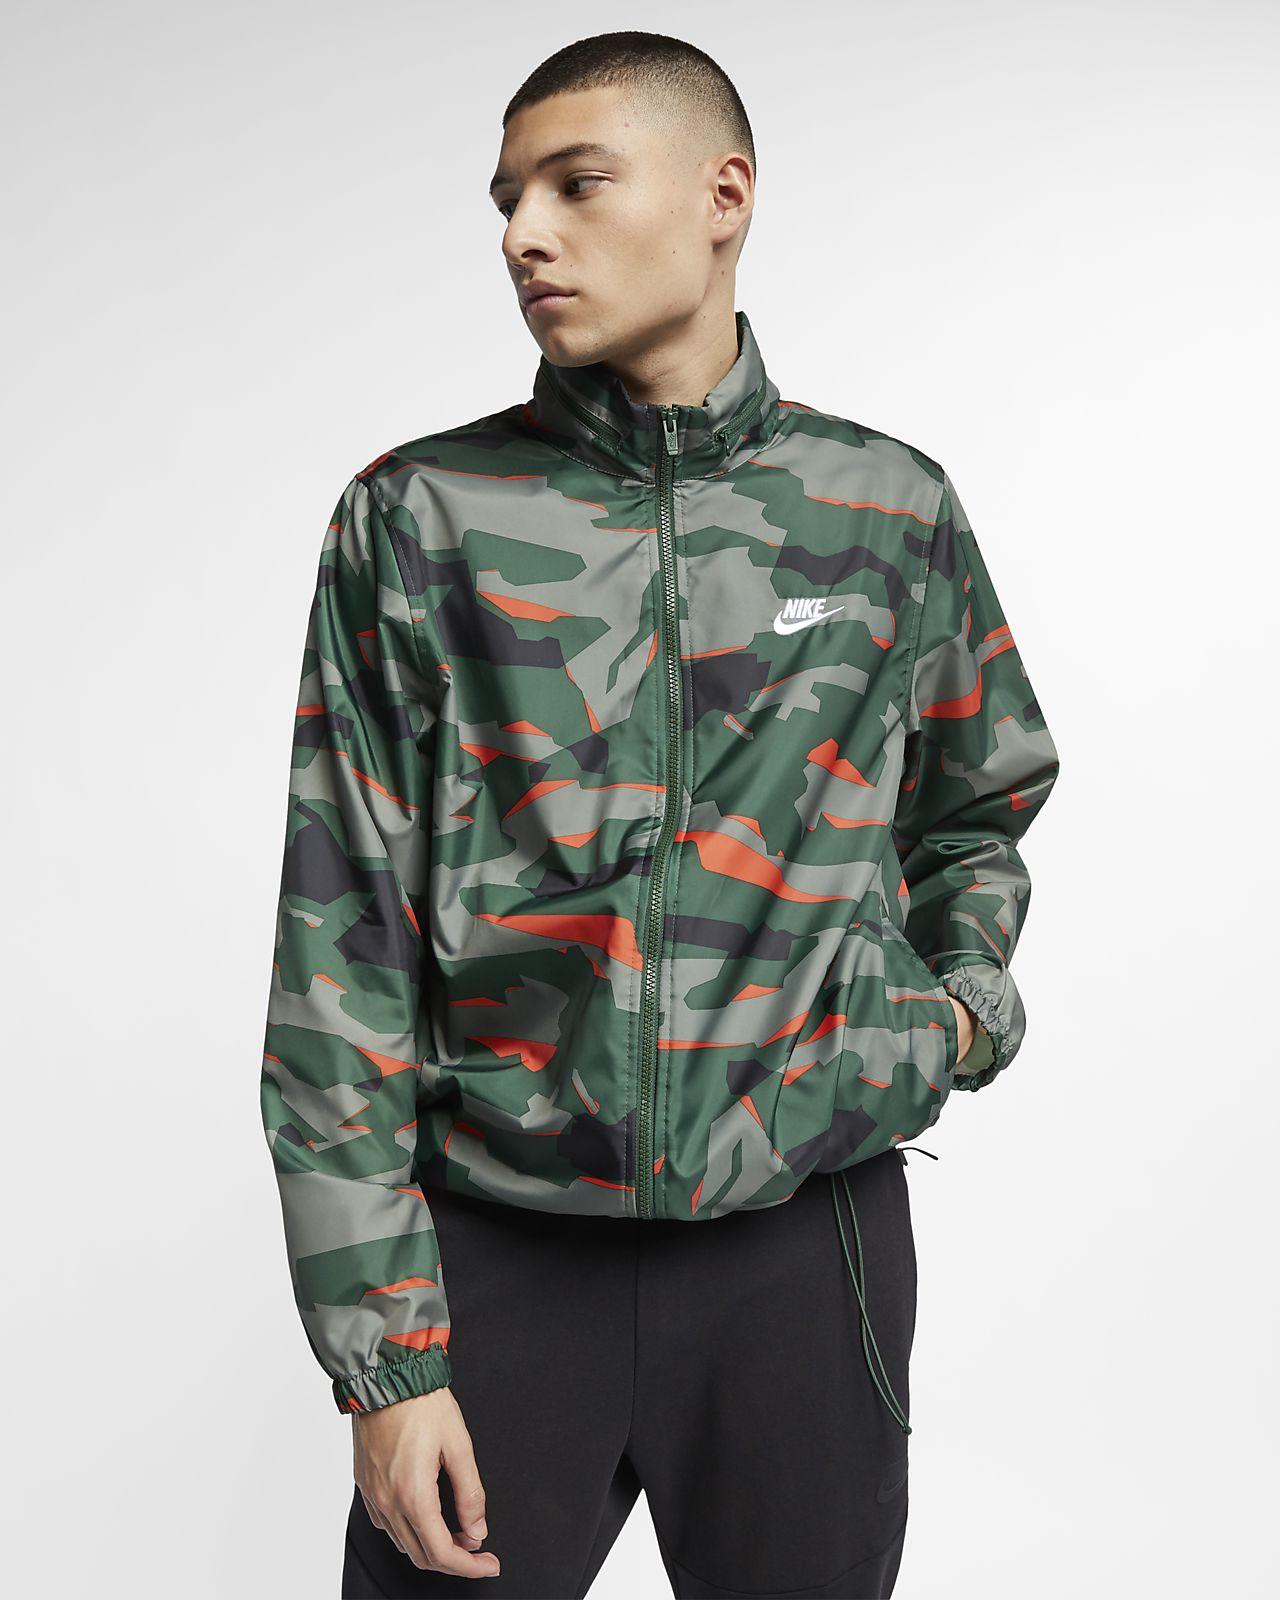 49cacbbc32d9 Nike Sportswear Men s Hooded Camo Jacket. Nike.com NL